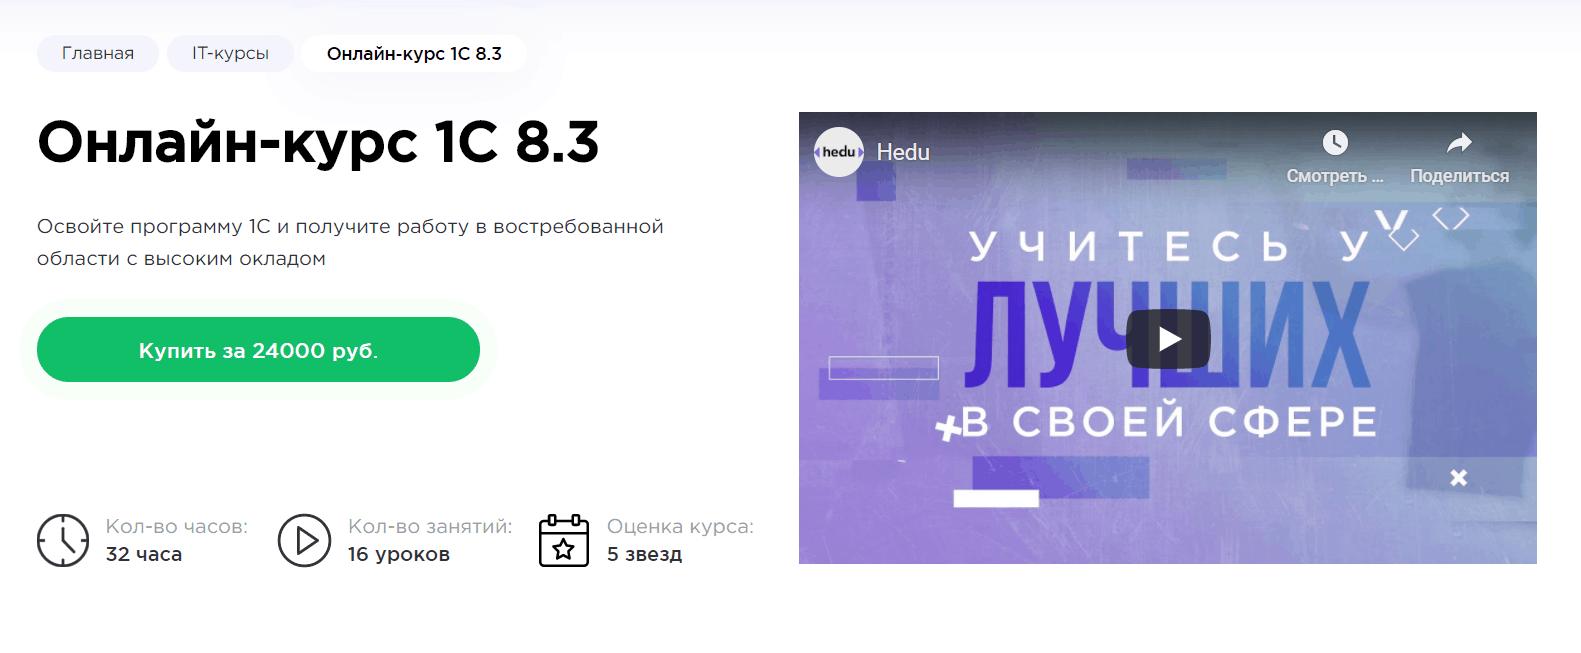 Онлайн-курс 1С 8.3